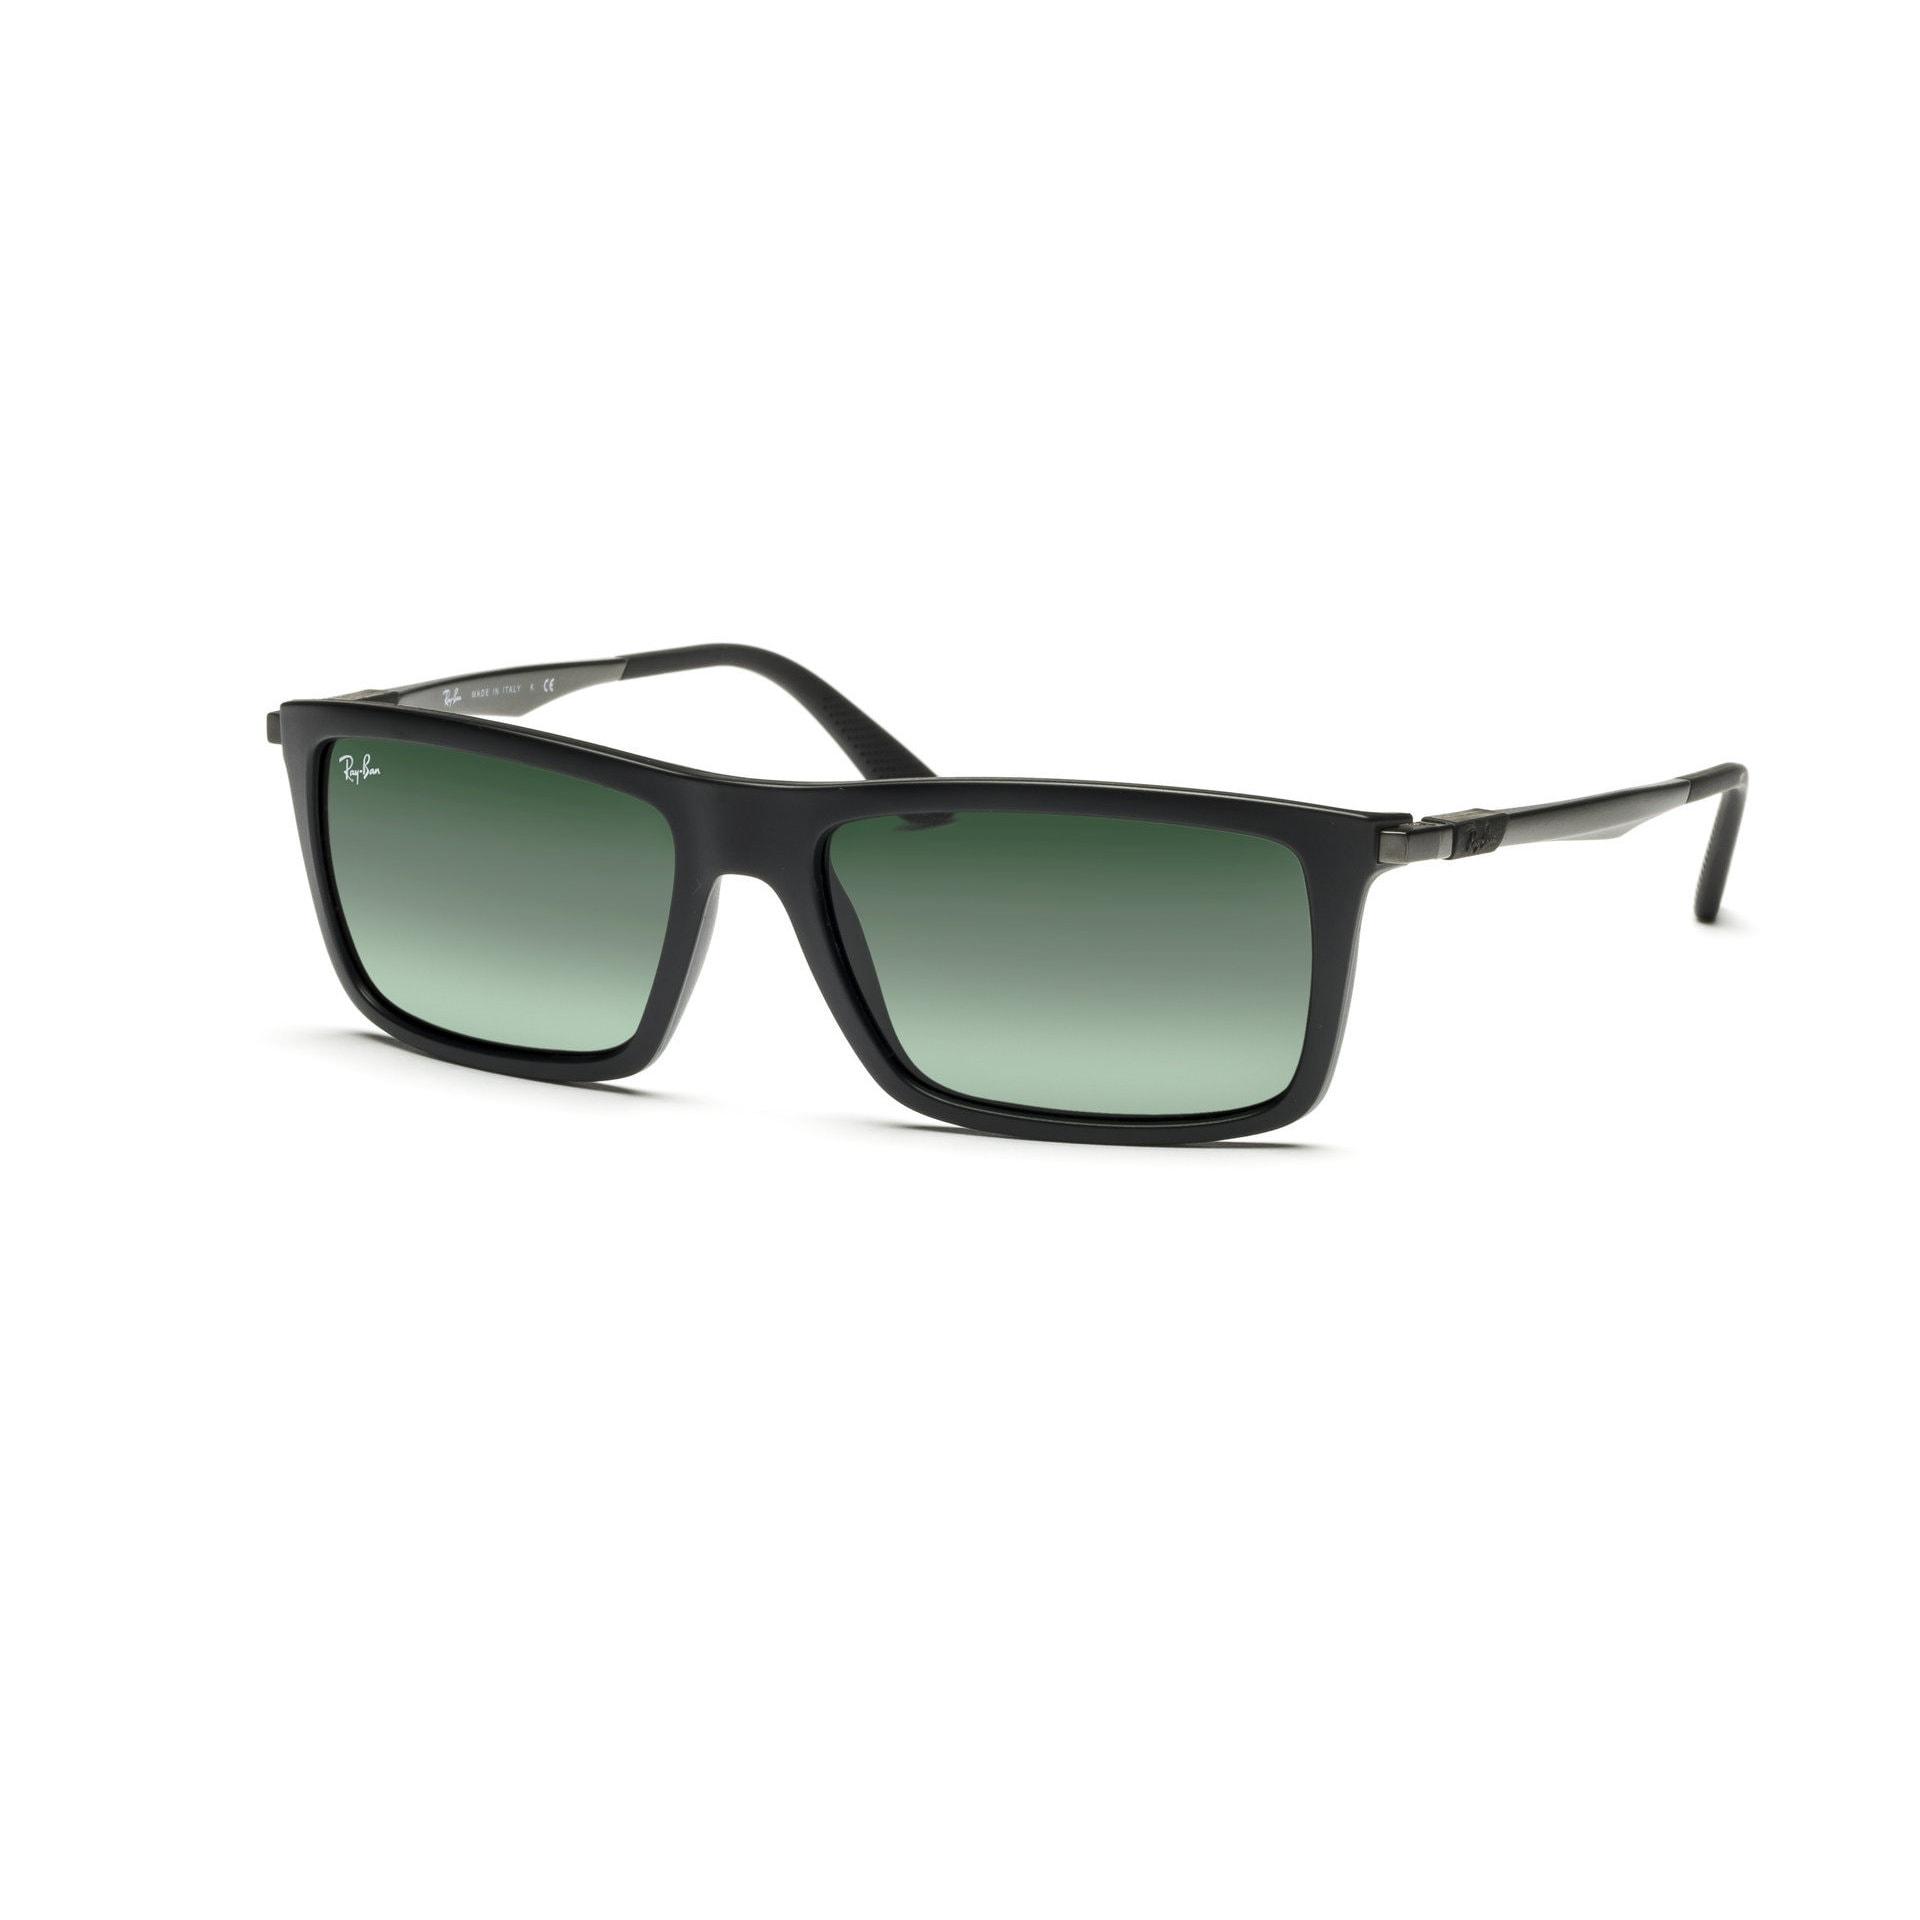 ecbb6f5ed3 Ray-Ban RB4214 601S71 59mm Green Classic Lenses Black Gunmetal Frame  Sunglasses